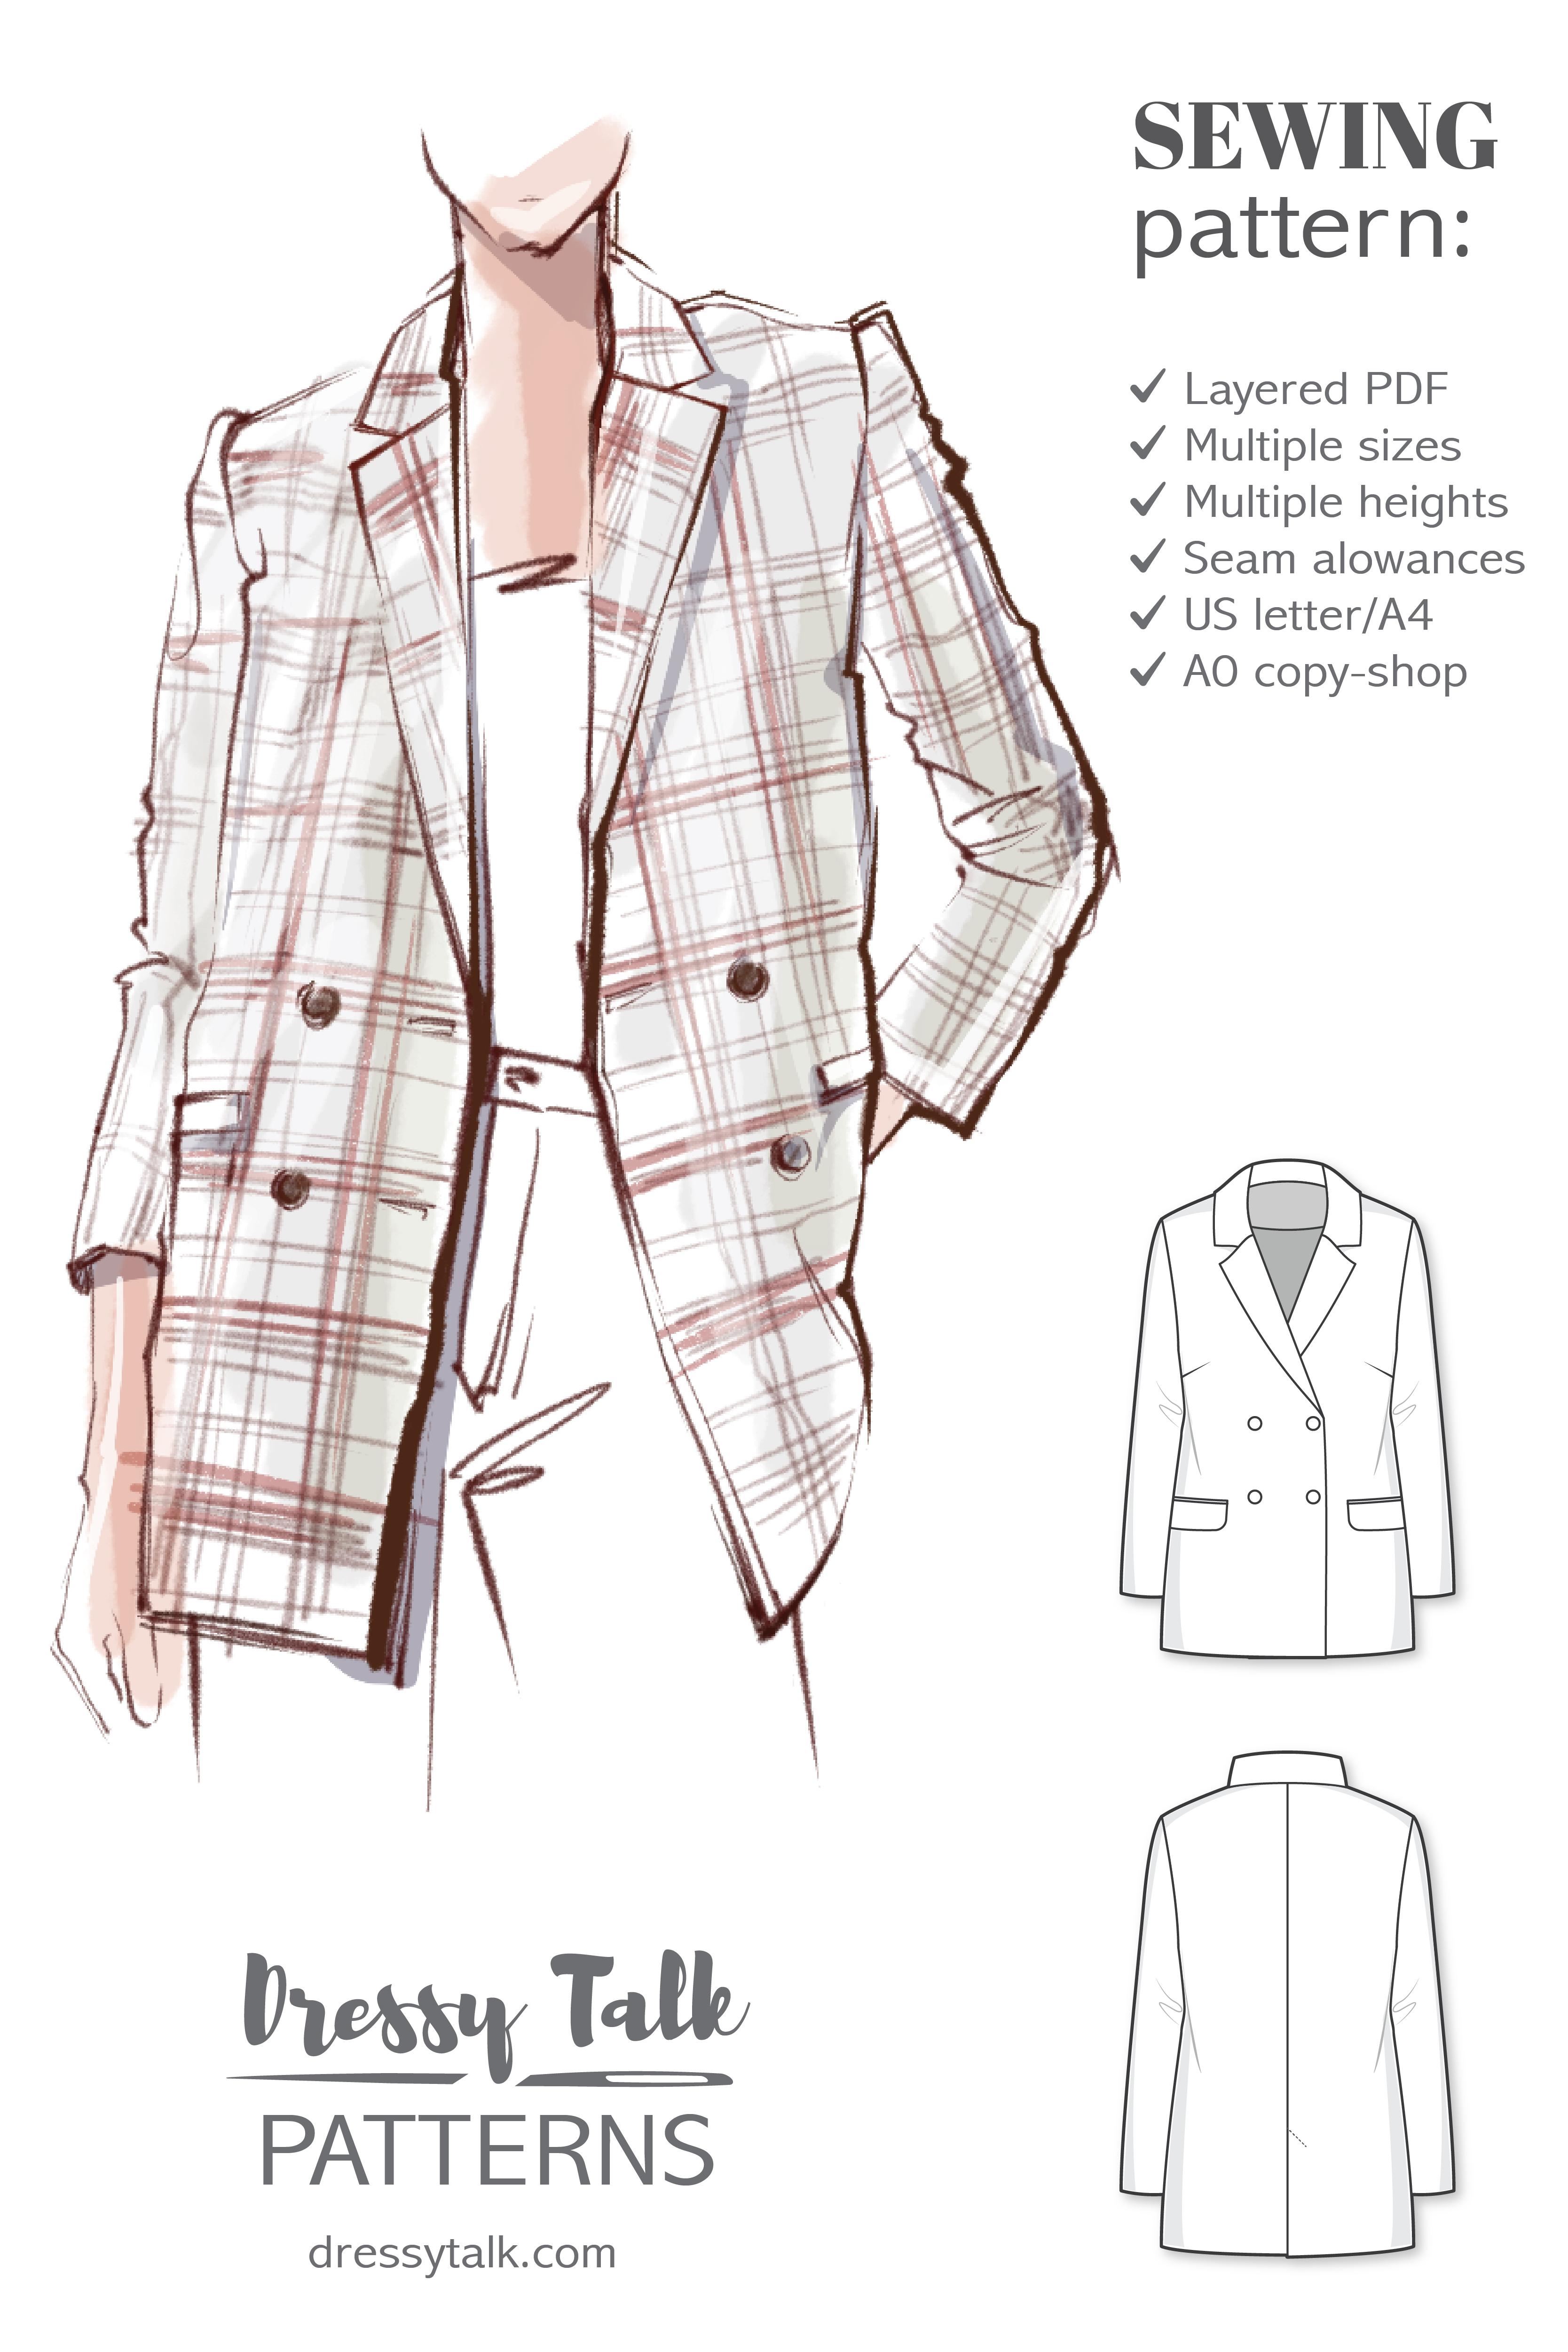 Women Blazer Patterns : women, blazer, patterns, Blazer, Sewing, Patterns, Womens, Pattern, Lined, Double, Breasted, Jacket, Modern, Sewing,, Pattern,